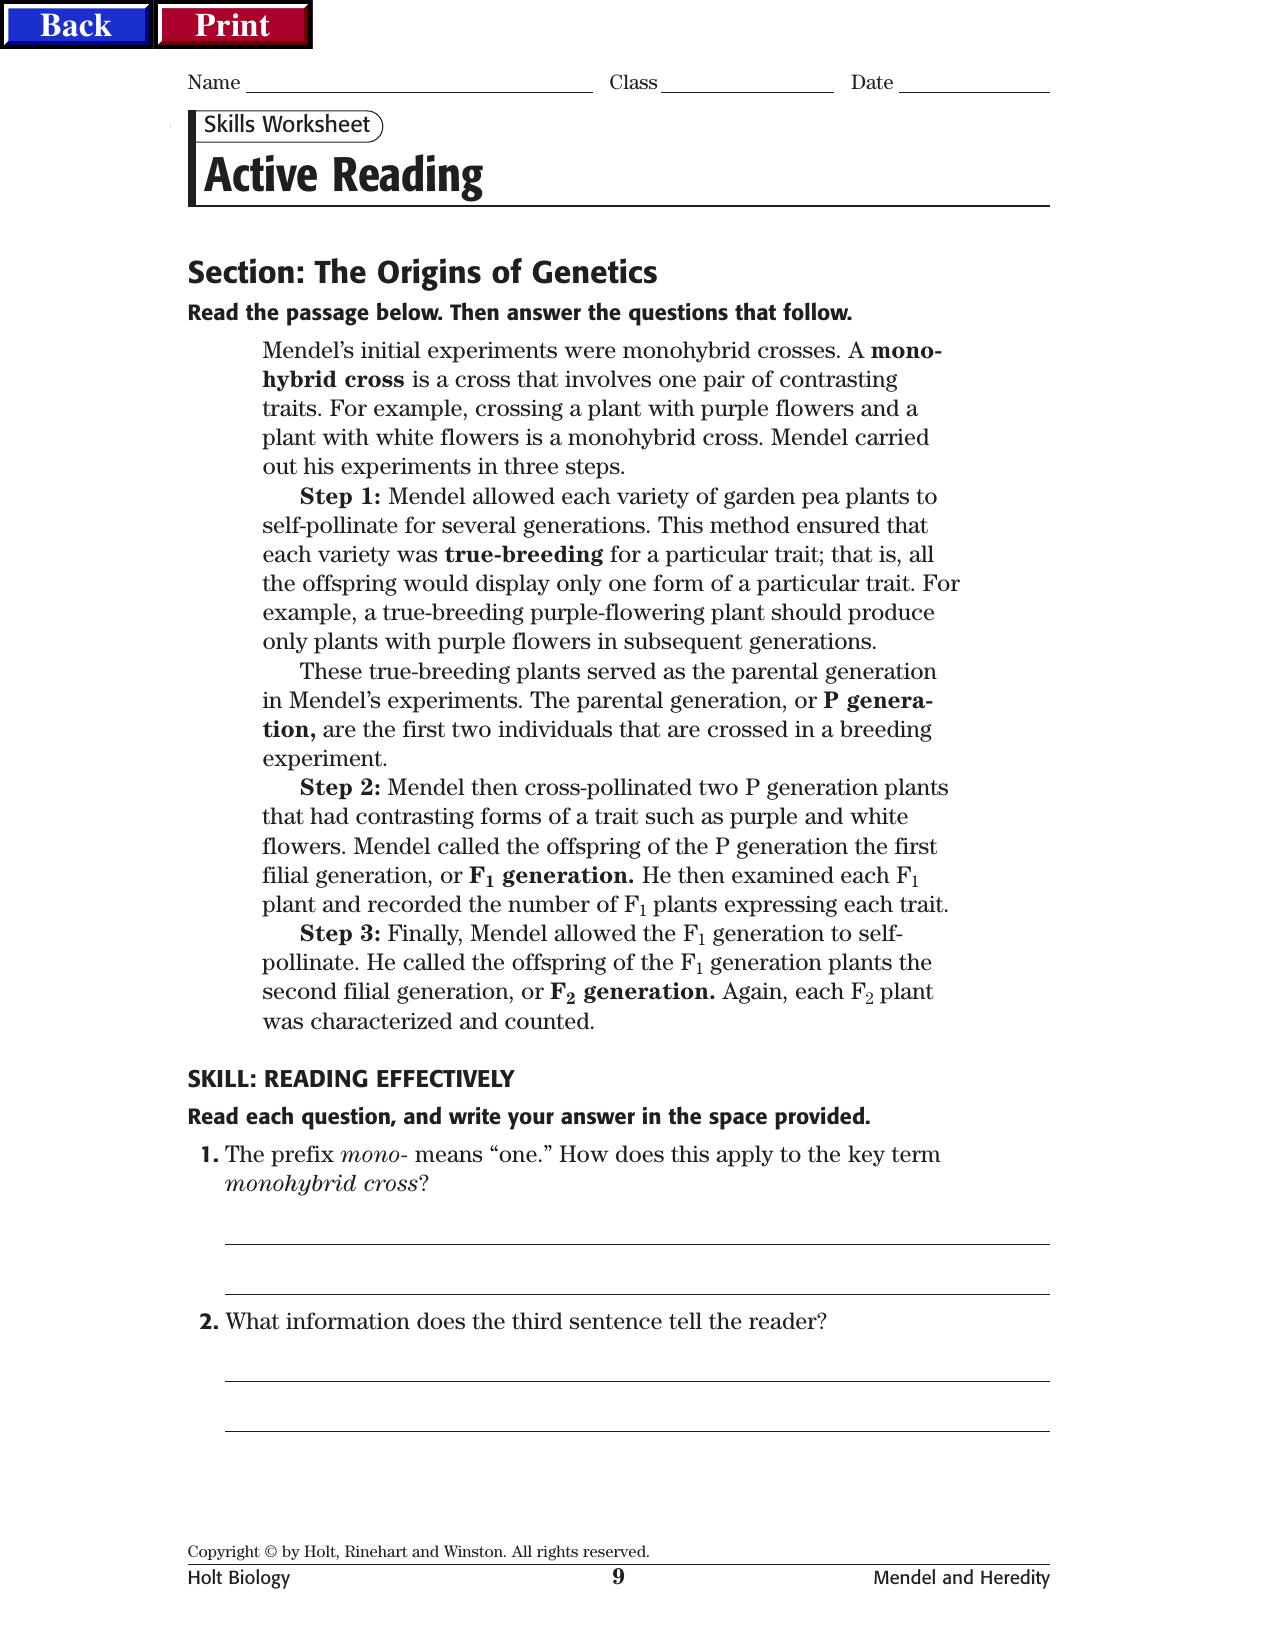 Holt biology homework help